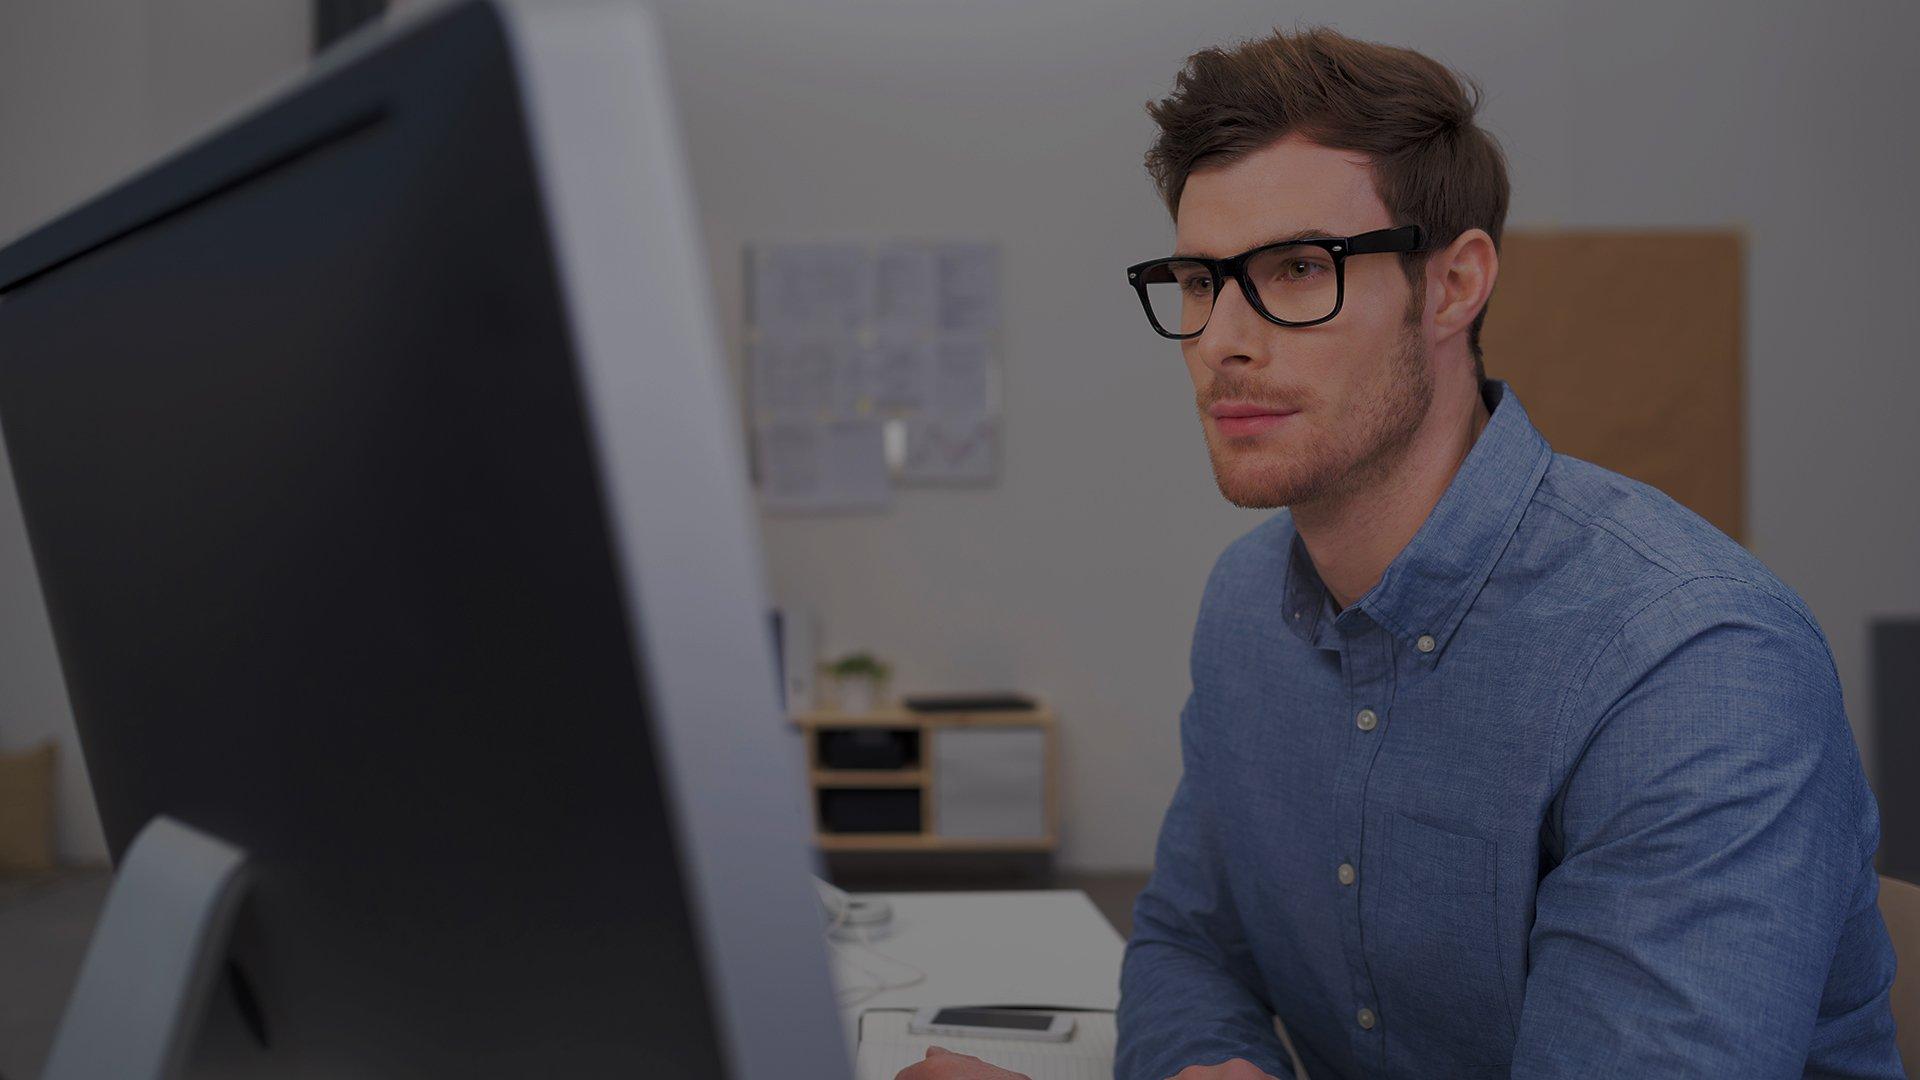 Header_Recruter-sourcer-sur-pole-emploi